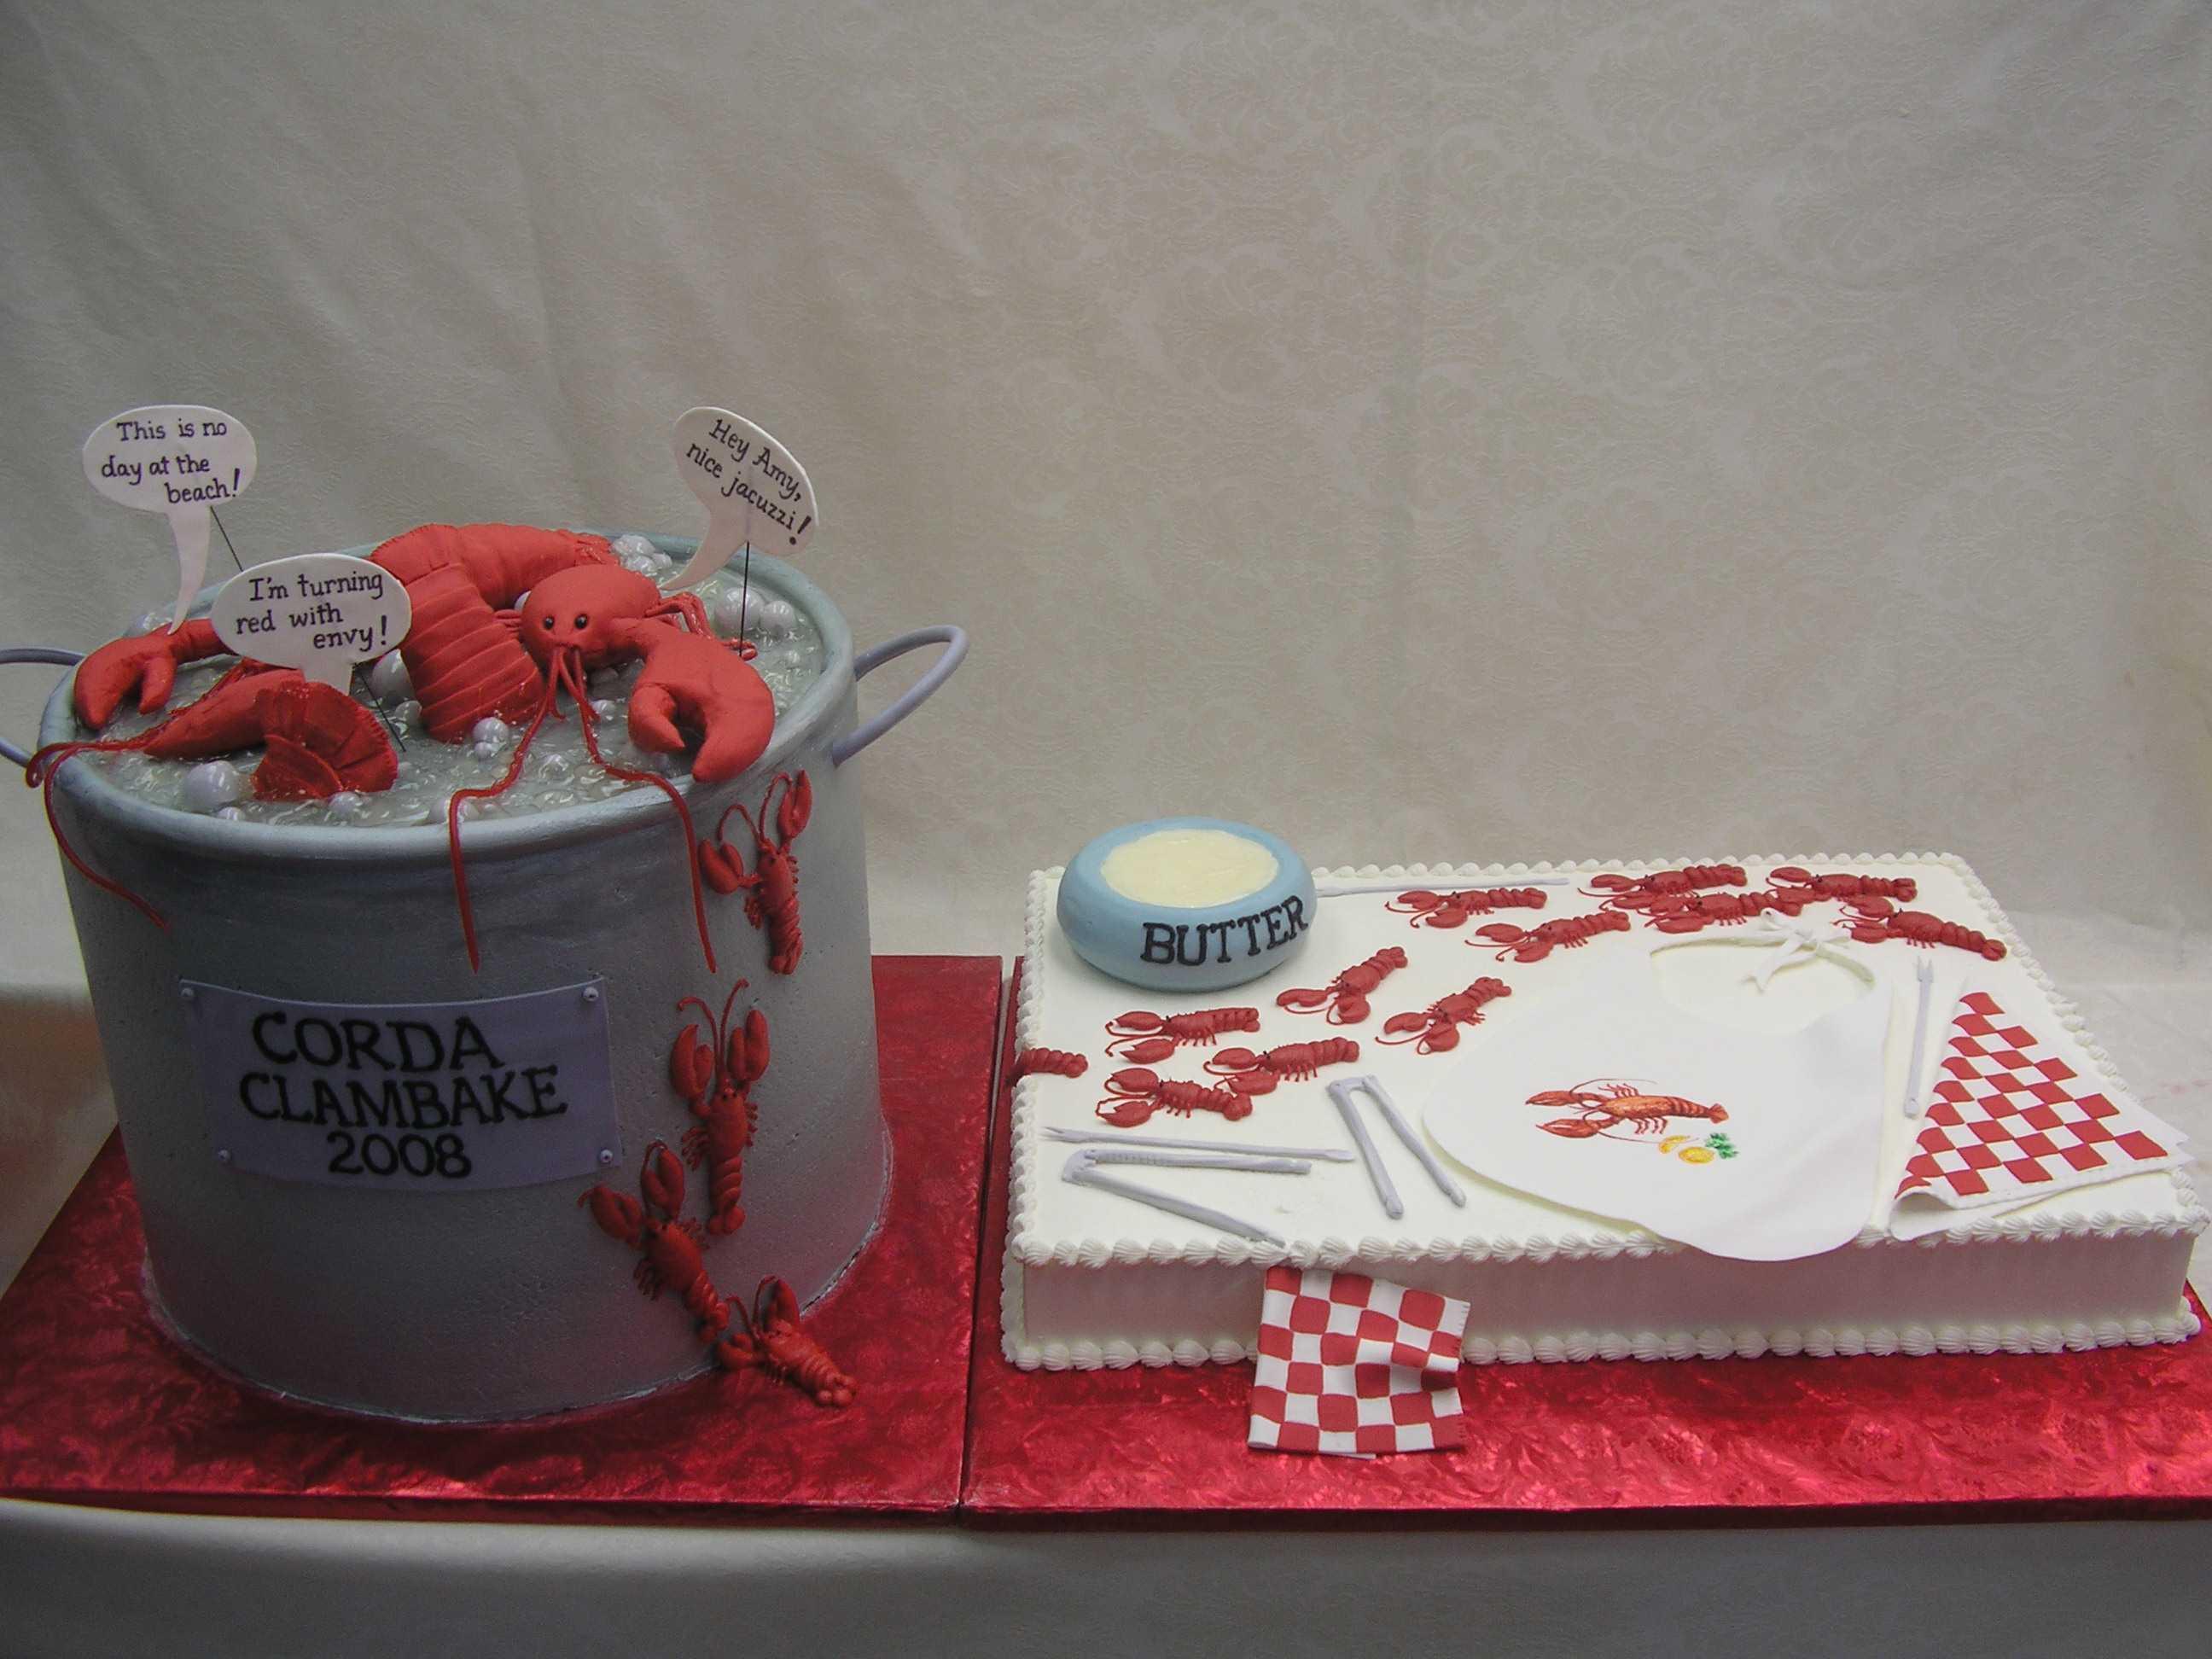 clambake cake